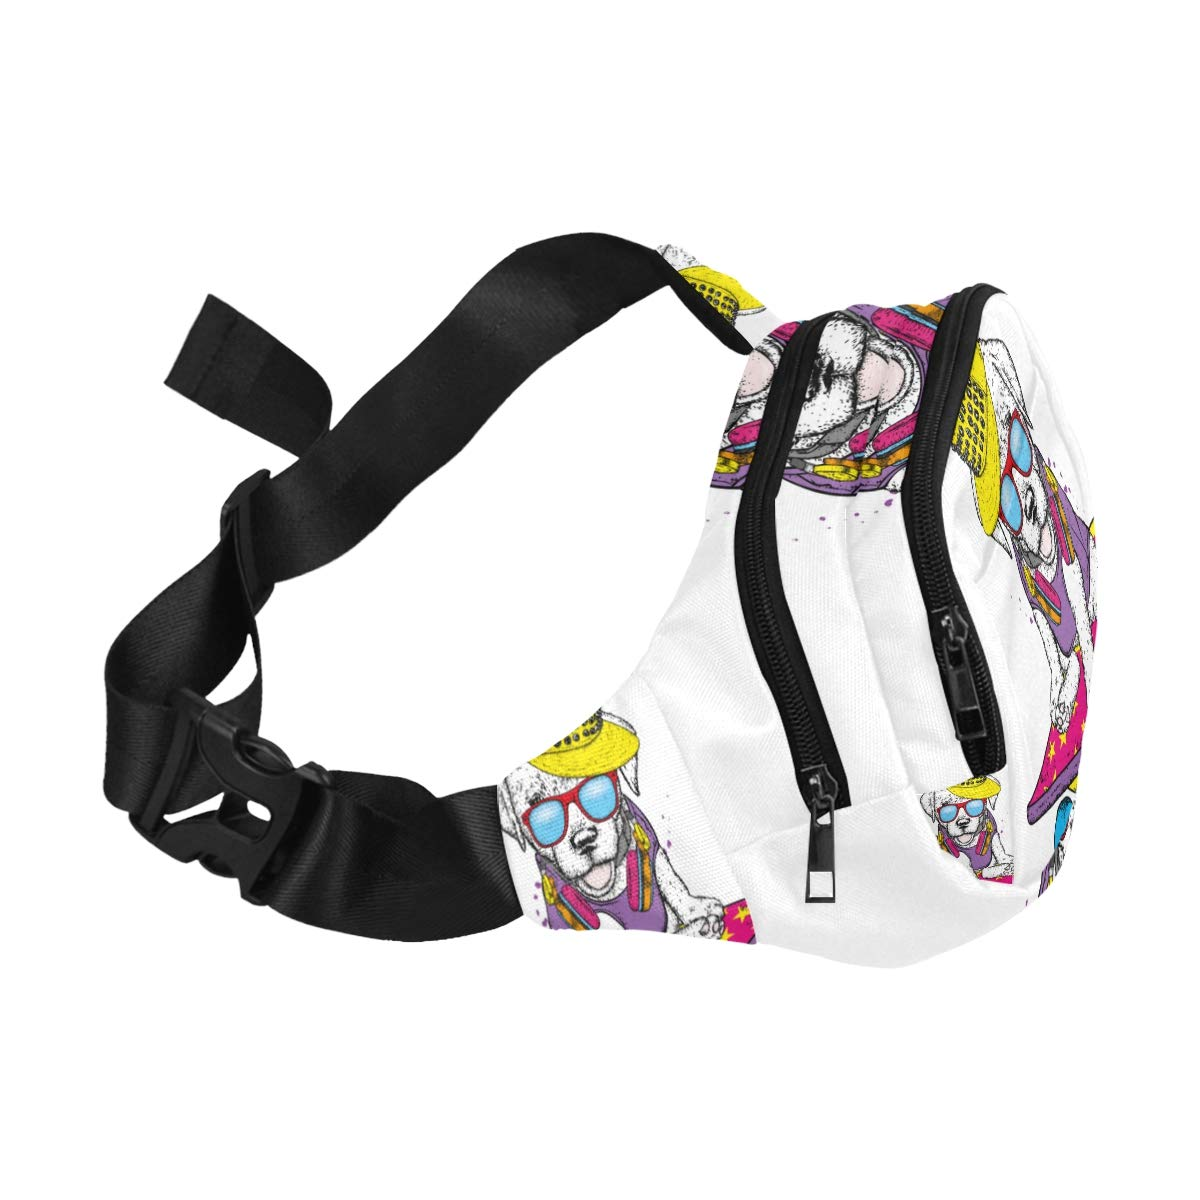 The Cute Dog Rides On A Skateboard Fenny Packs Waist Bags Adjustable Belt Waterproof Nylon Travel Running Sport Vacation Party For Men Women Boys Girls Kids